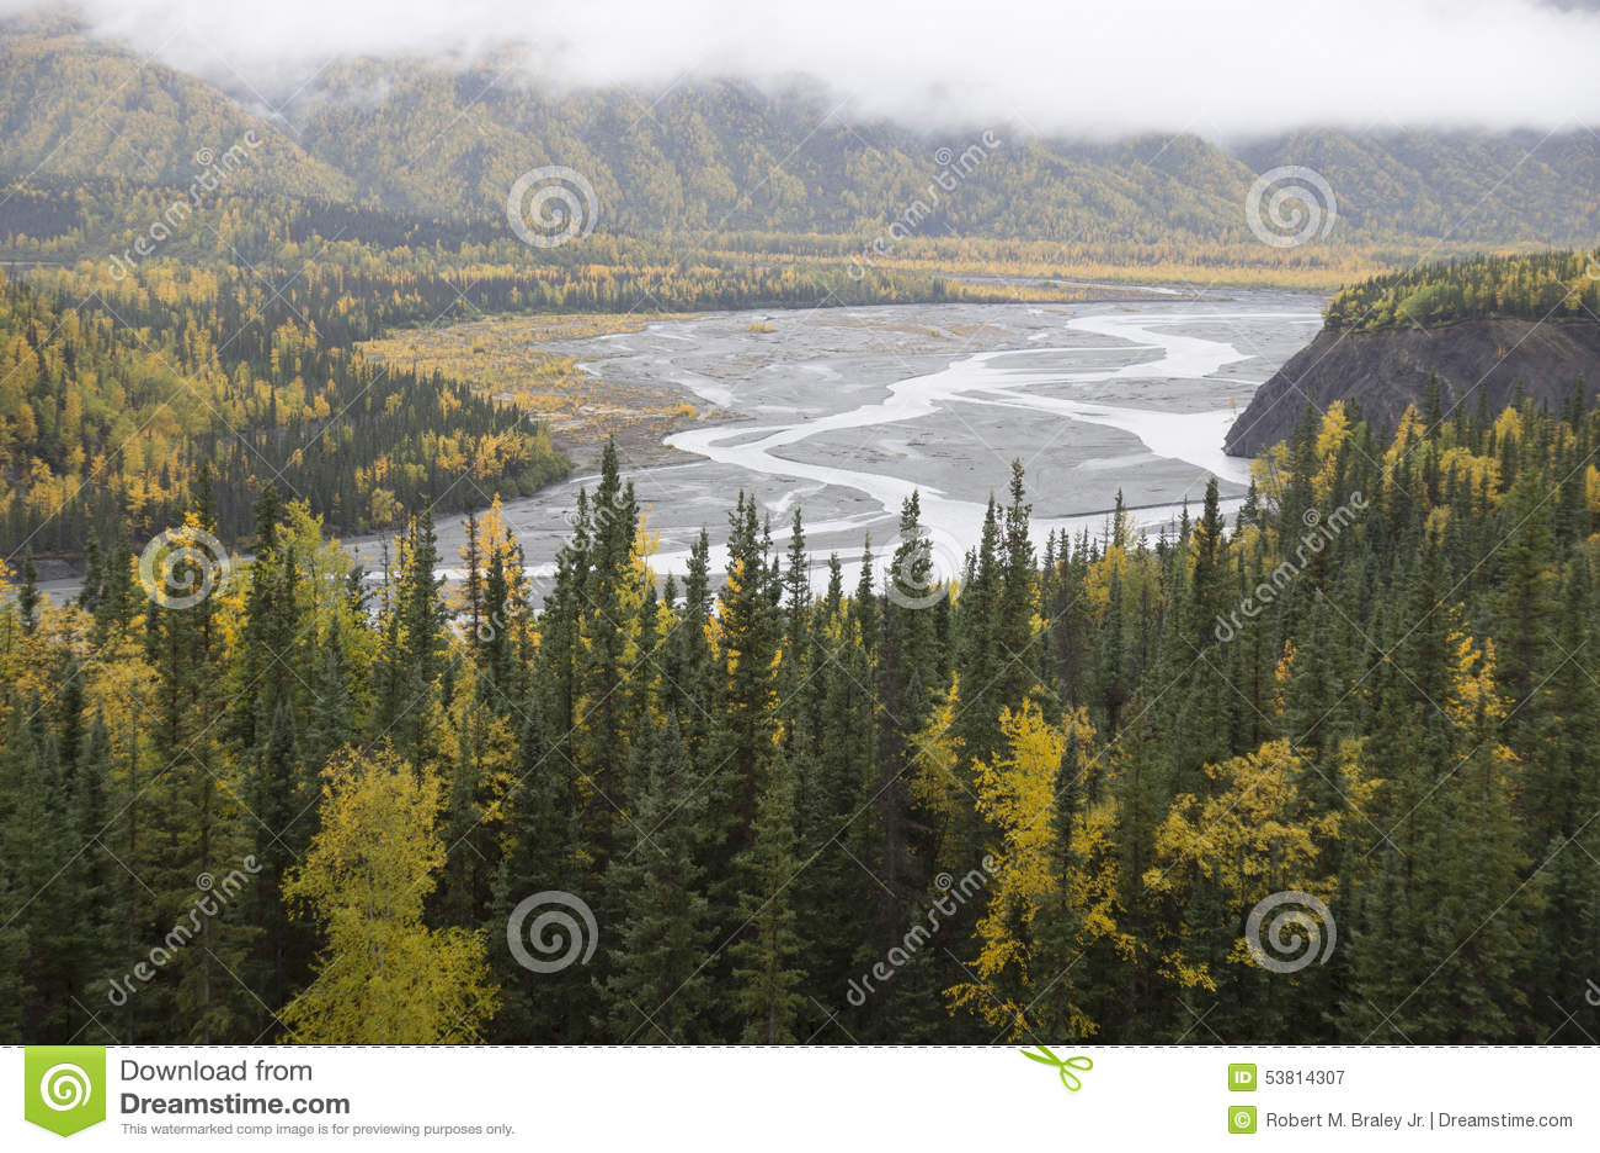 Alaska Matanuska Valley River Fall Trees